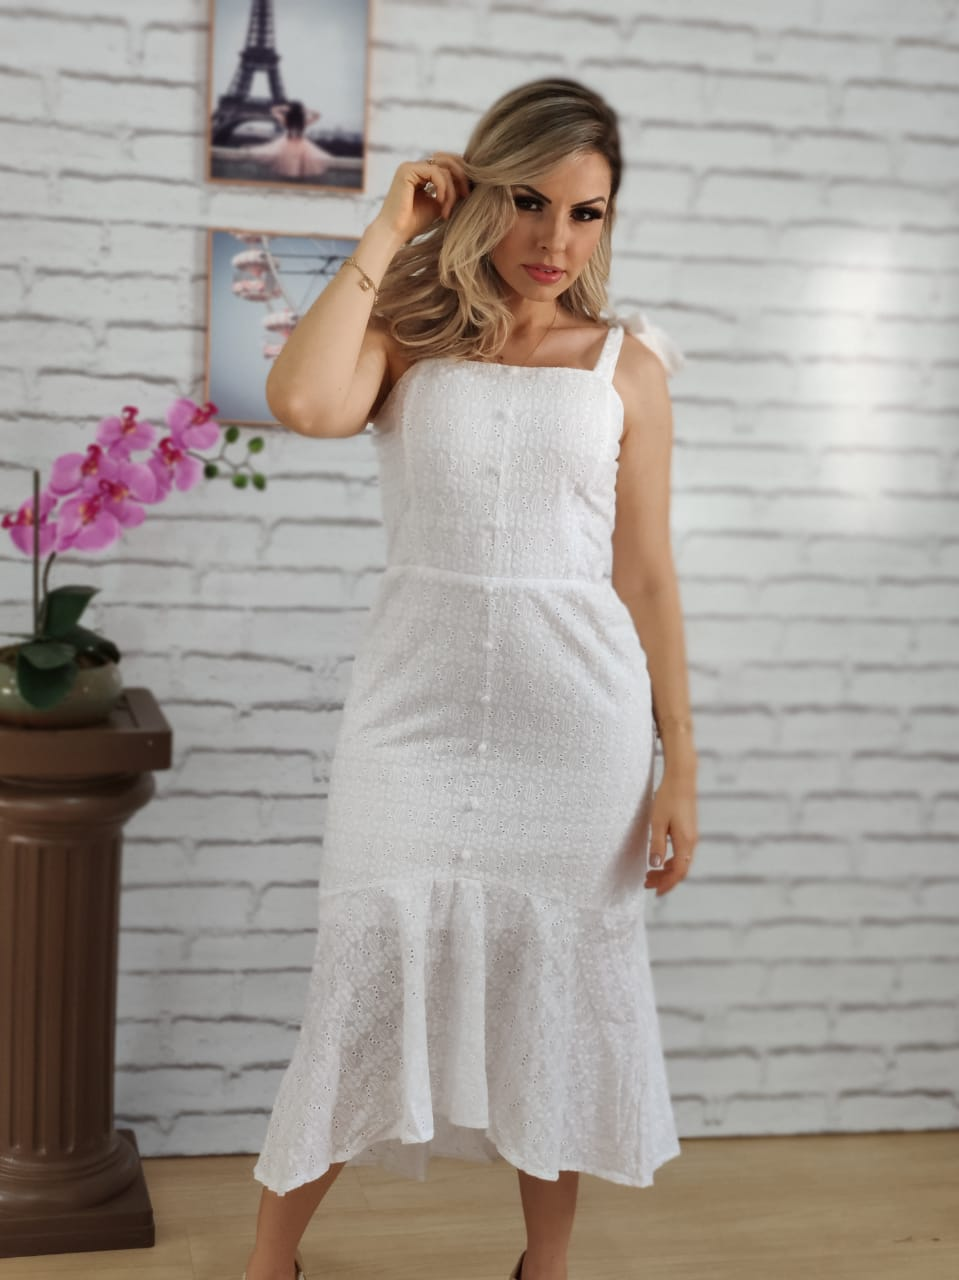 Vestido Midi em Laise Laço Alça Branco